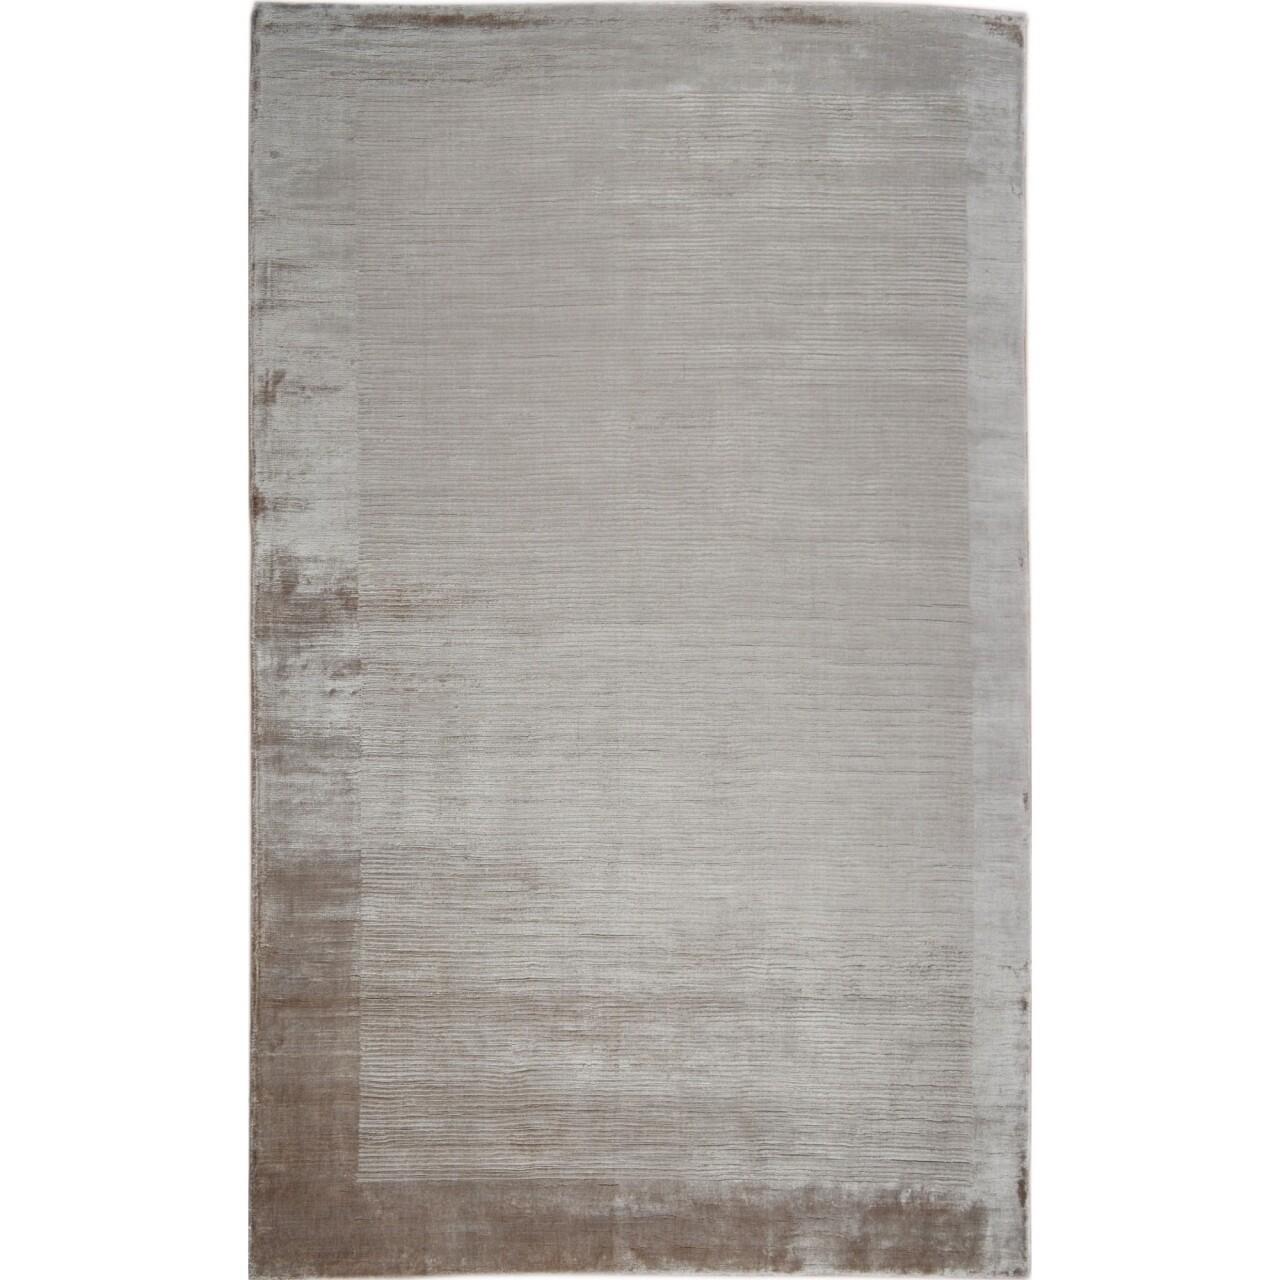 Covor rezistent Alya 3300 - Dark Mink, 80x150 cm